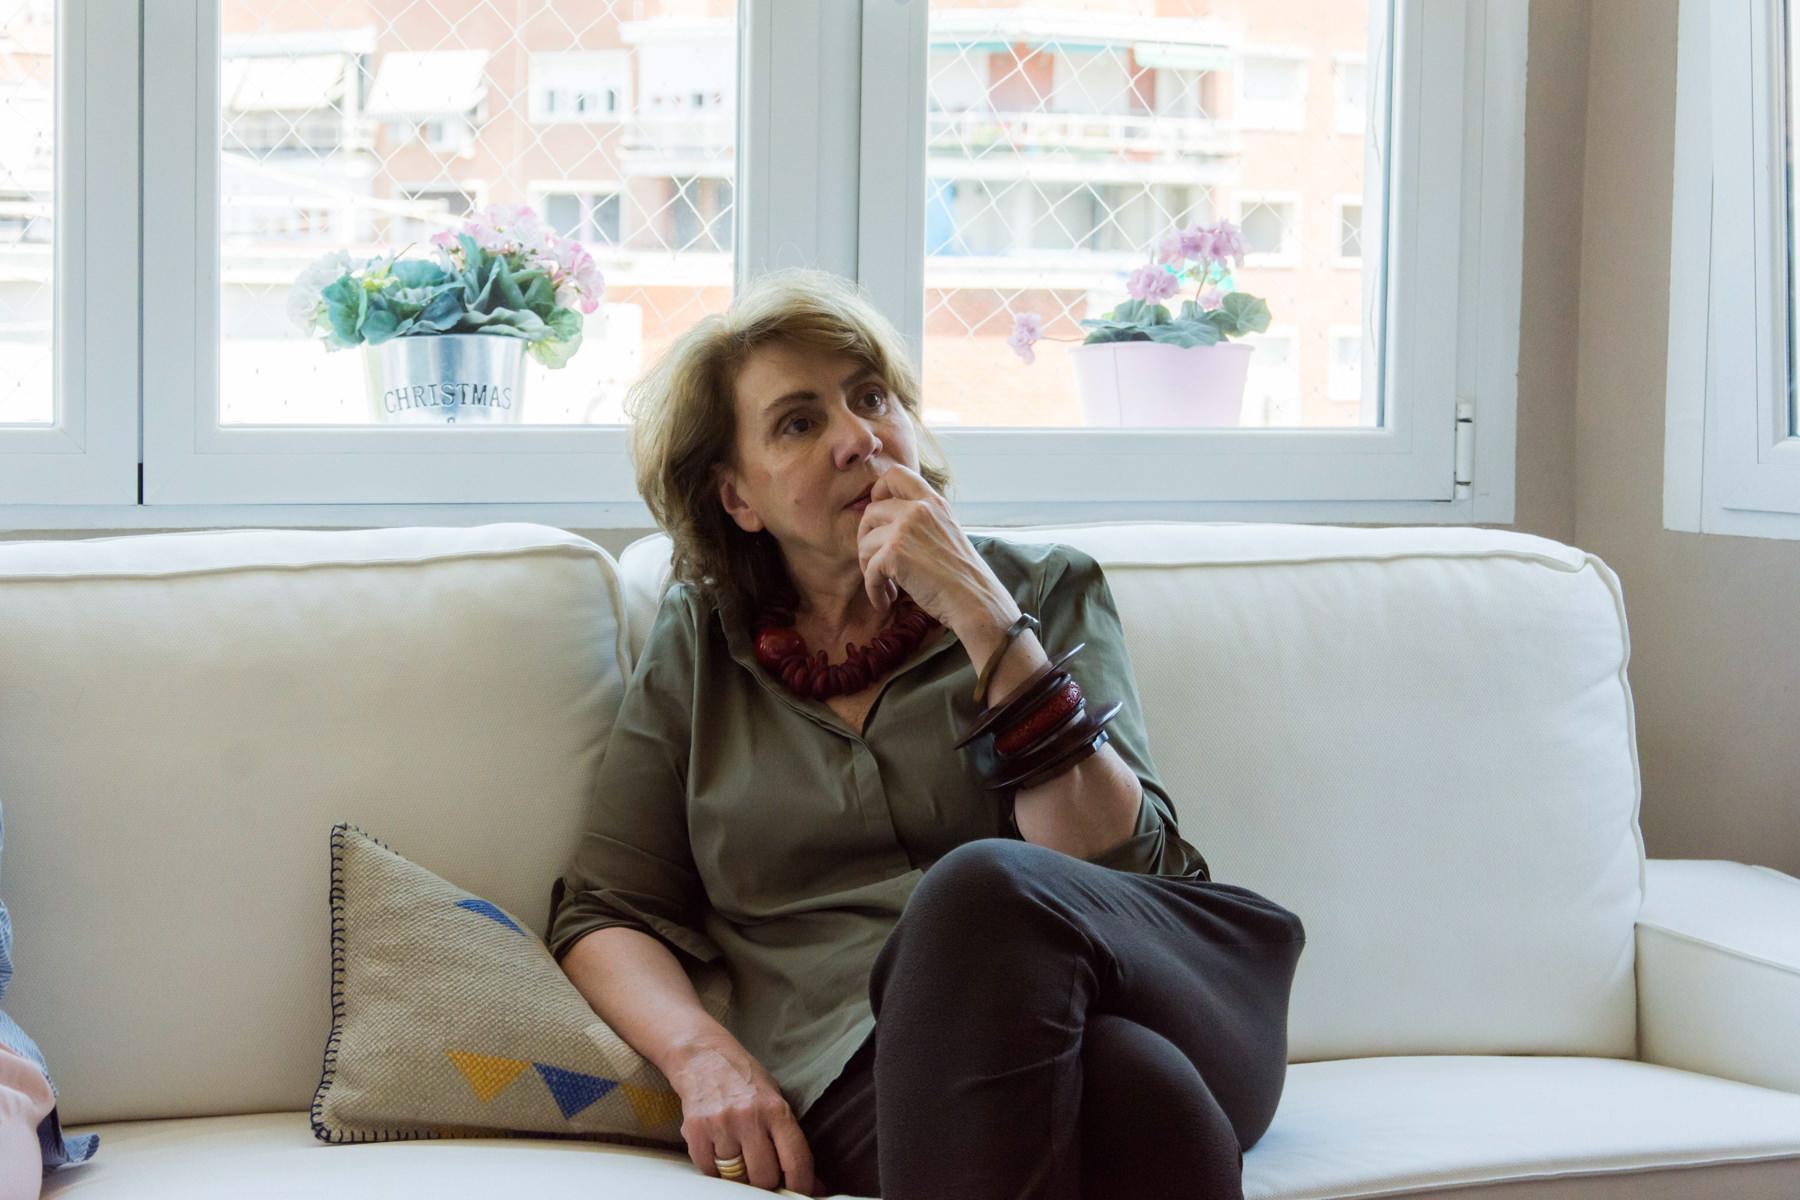 Secretos de estilo con Noemi Vázquez Roselli